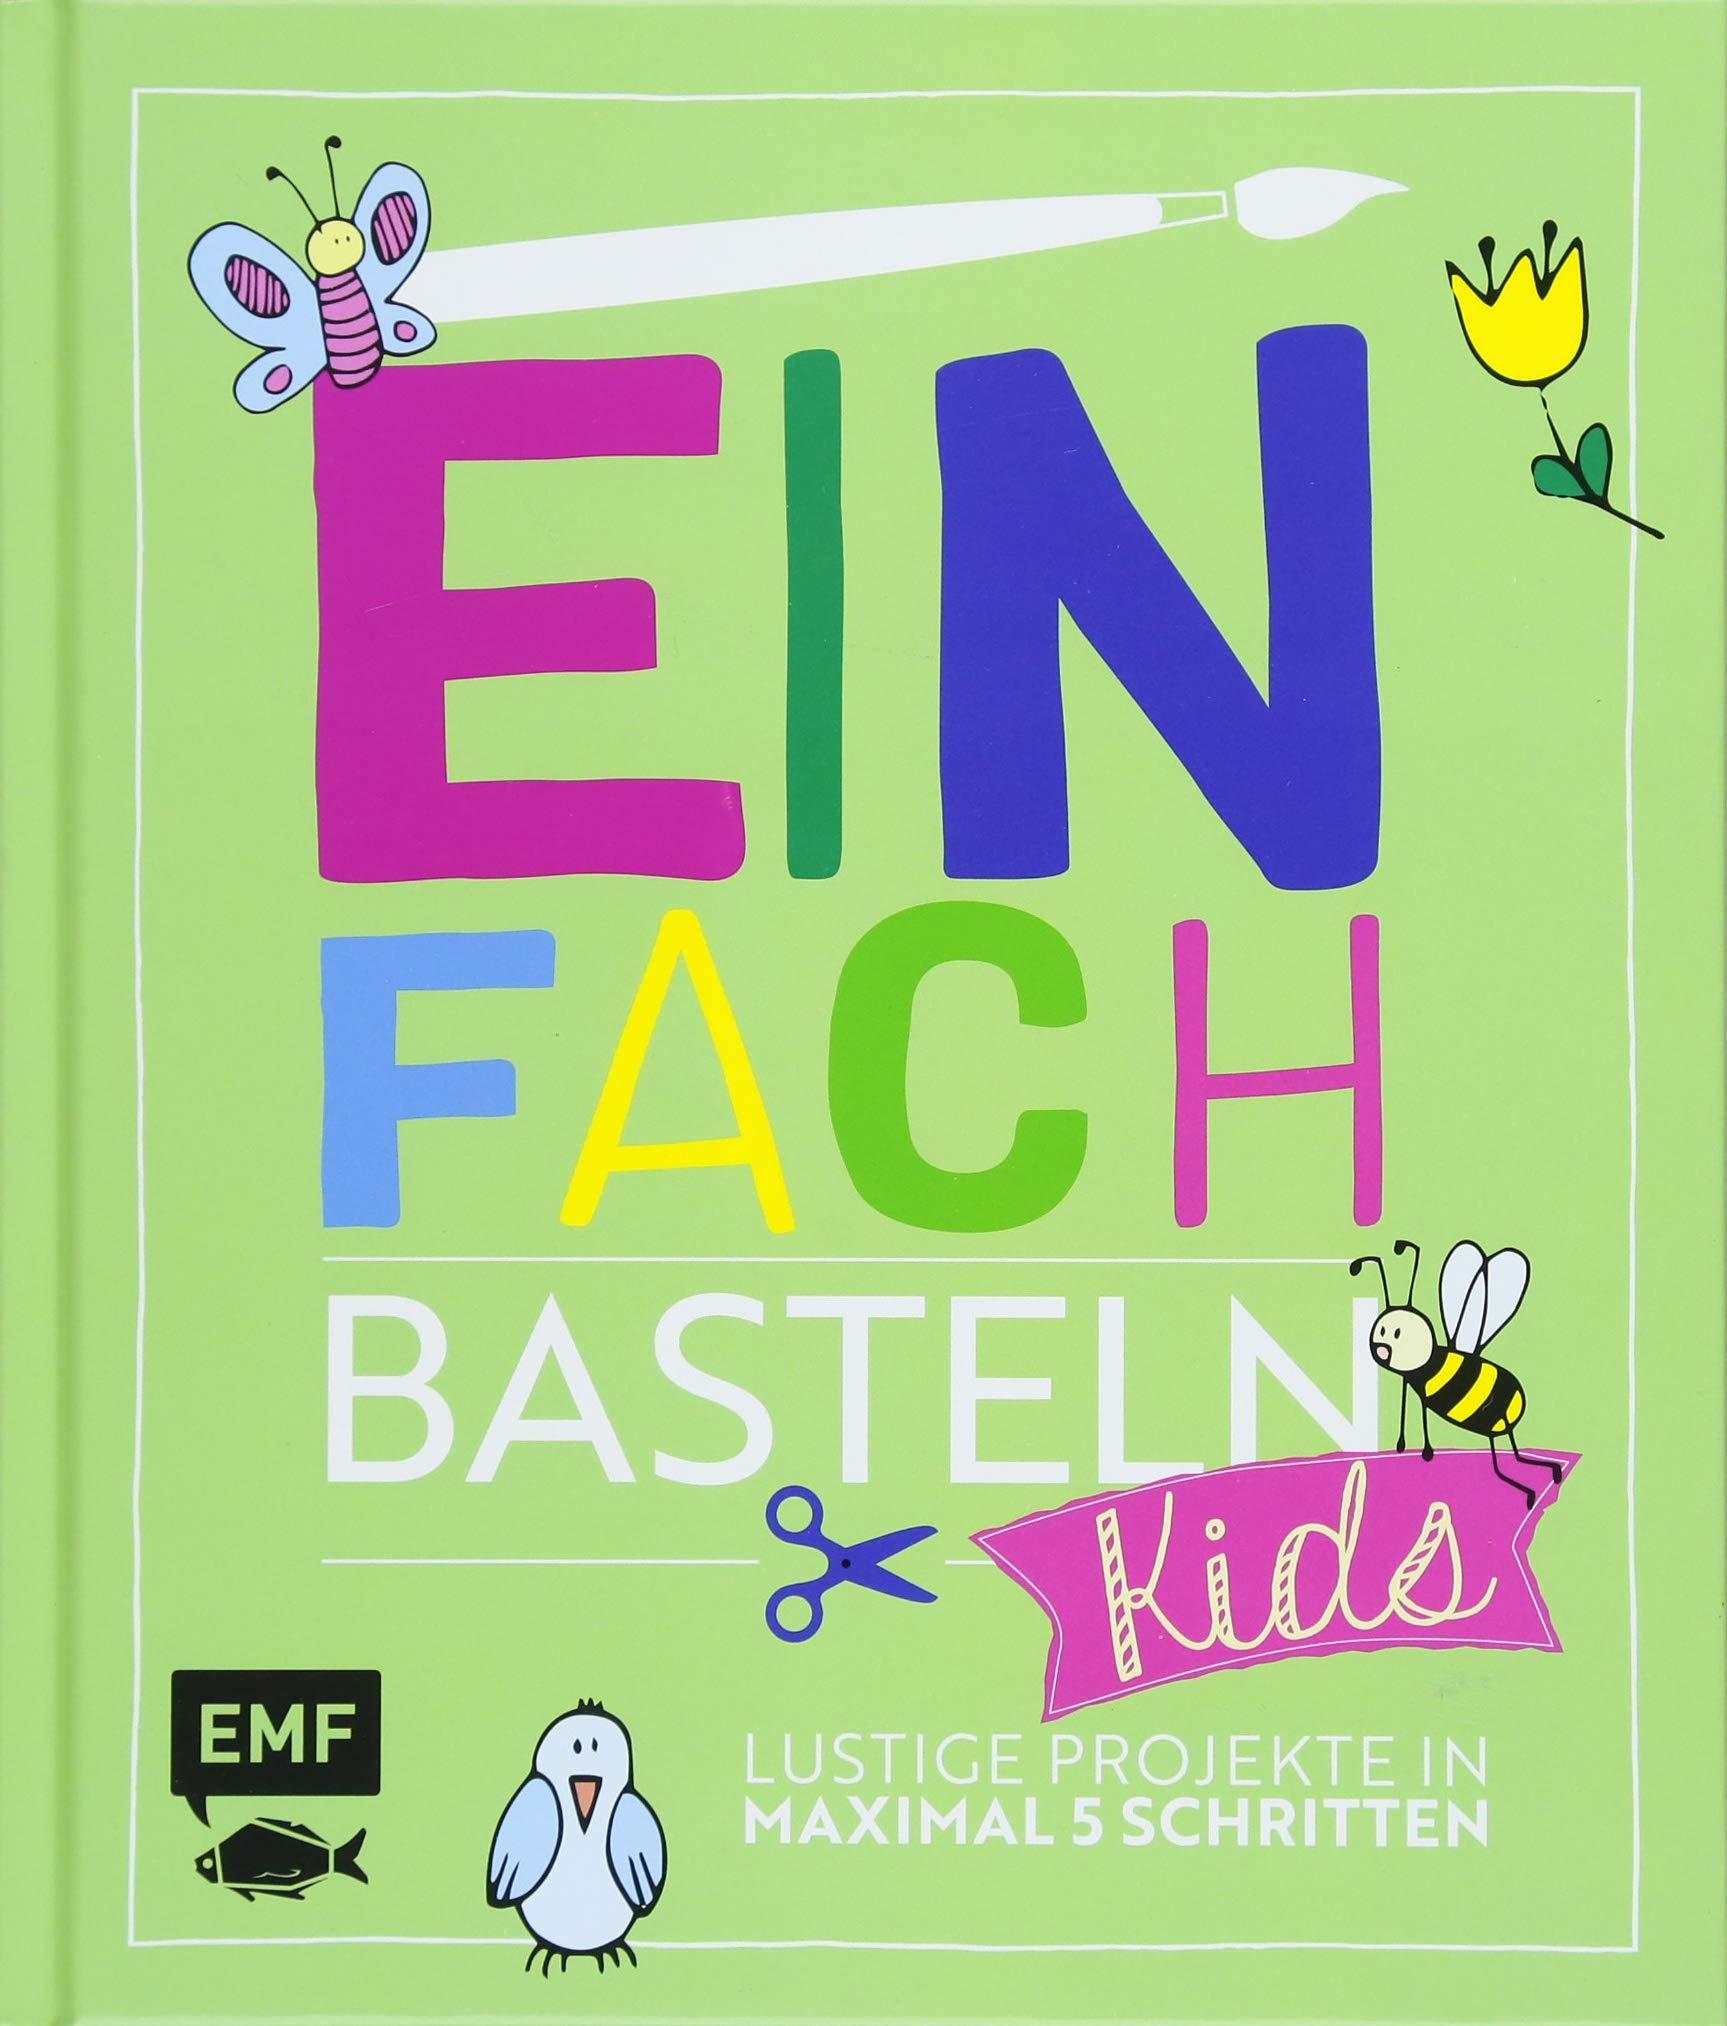 Elegant Einfach Basteln Kids: Lustige Projekte In Maximal 5 Schritten: Amazon.de:  Swantje Lindemann, Verena Wöhlk Appel, Daniela Fugger: Bücher